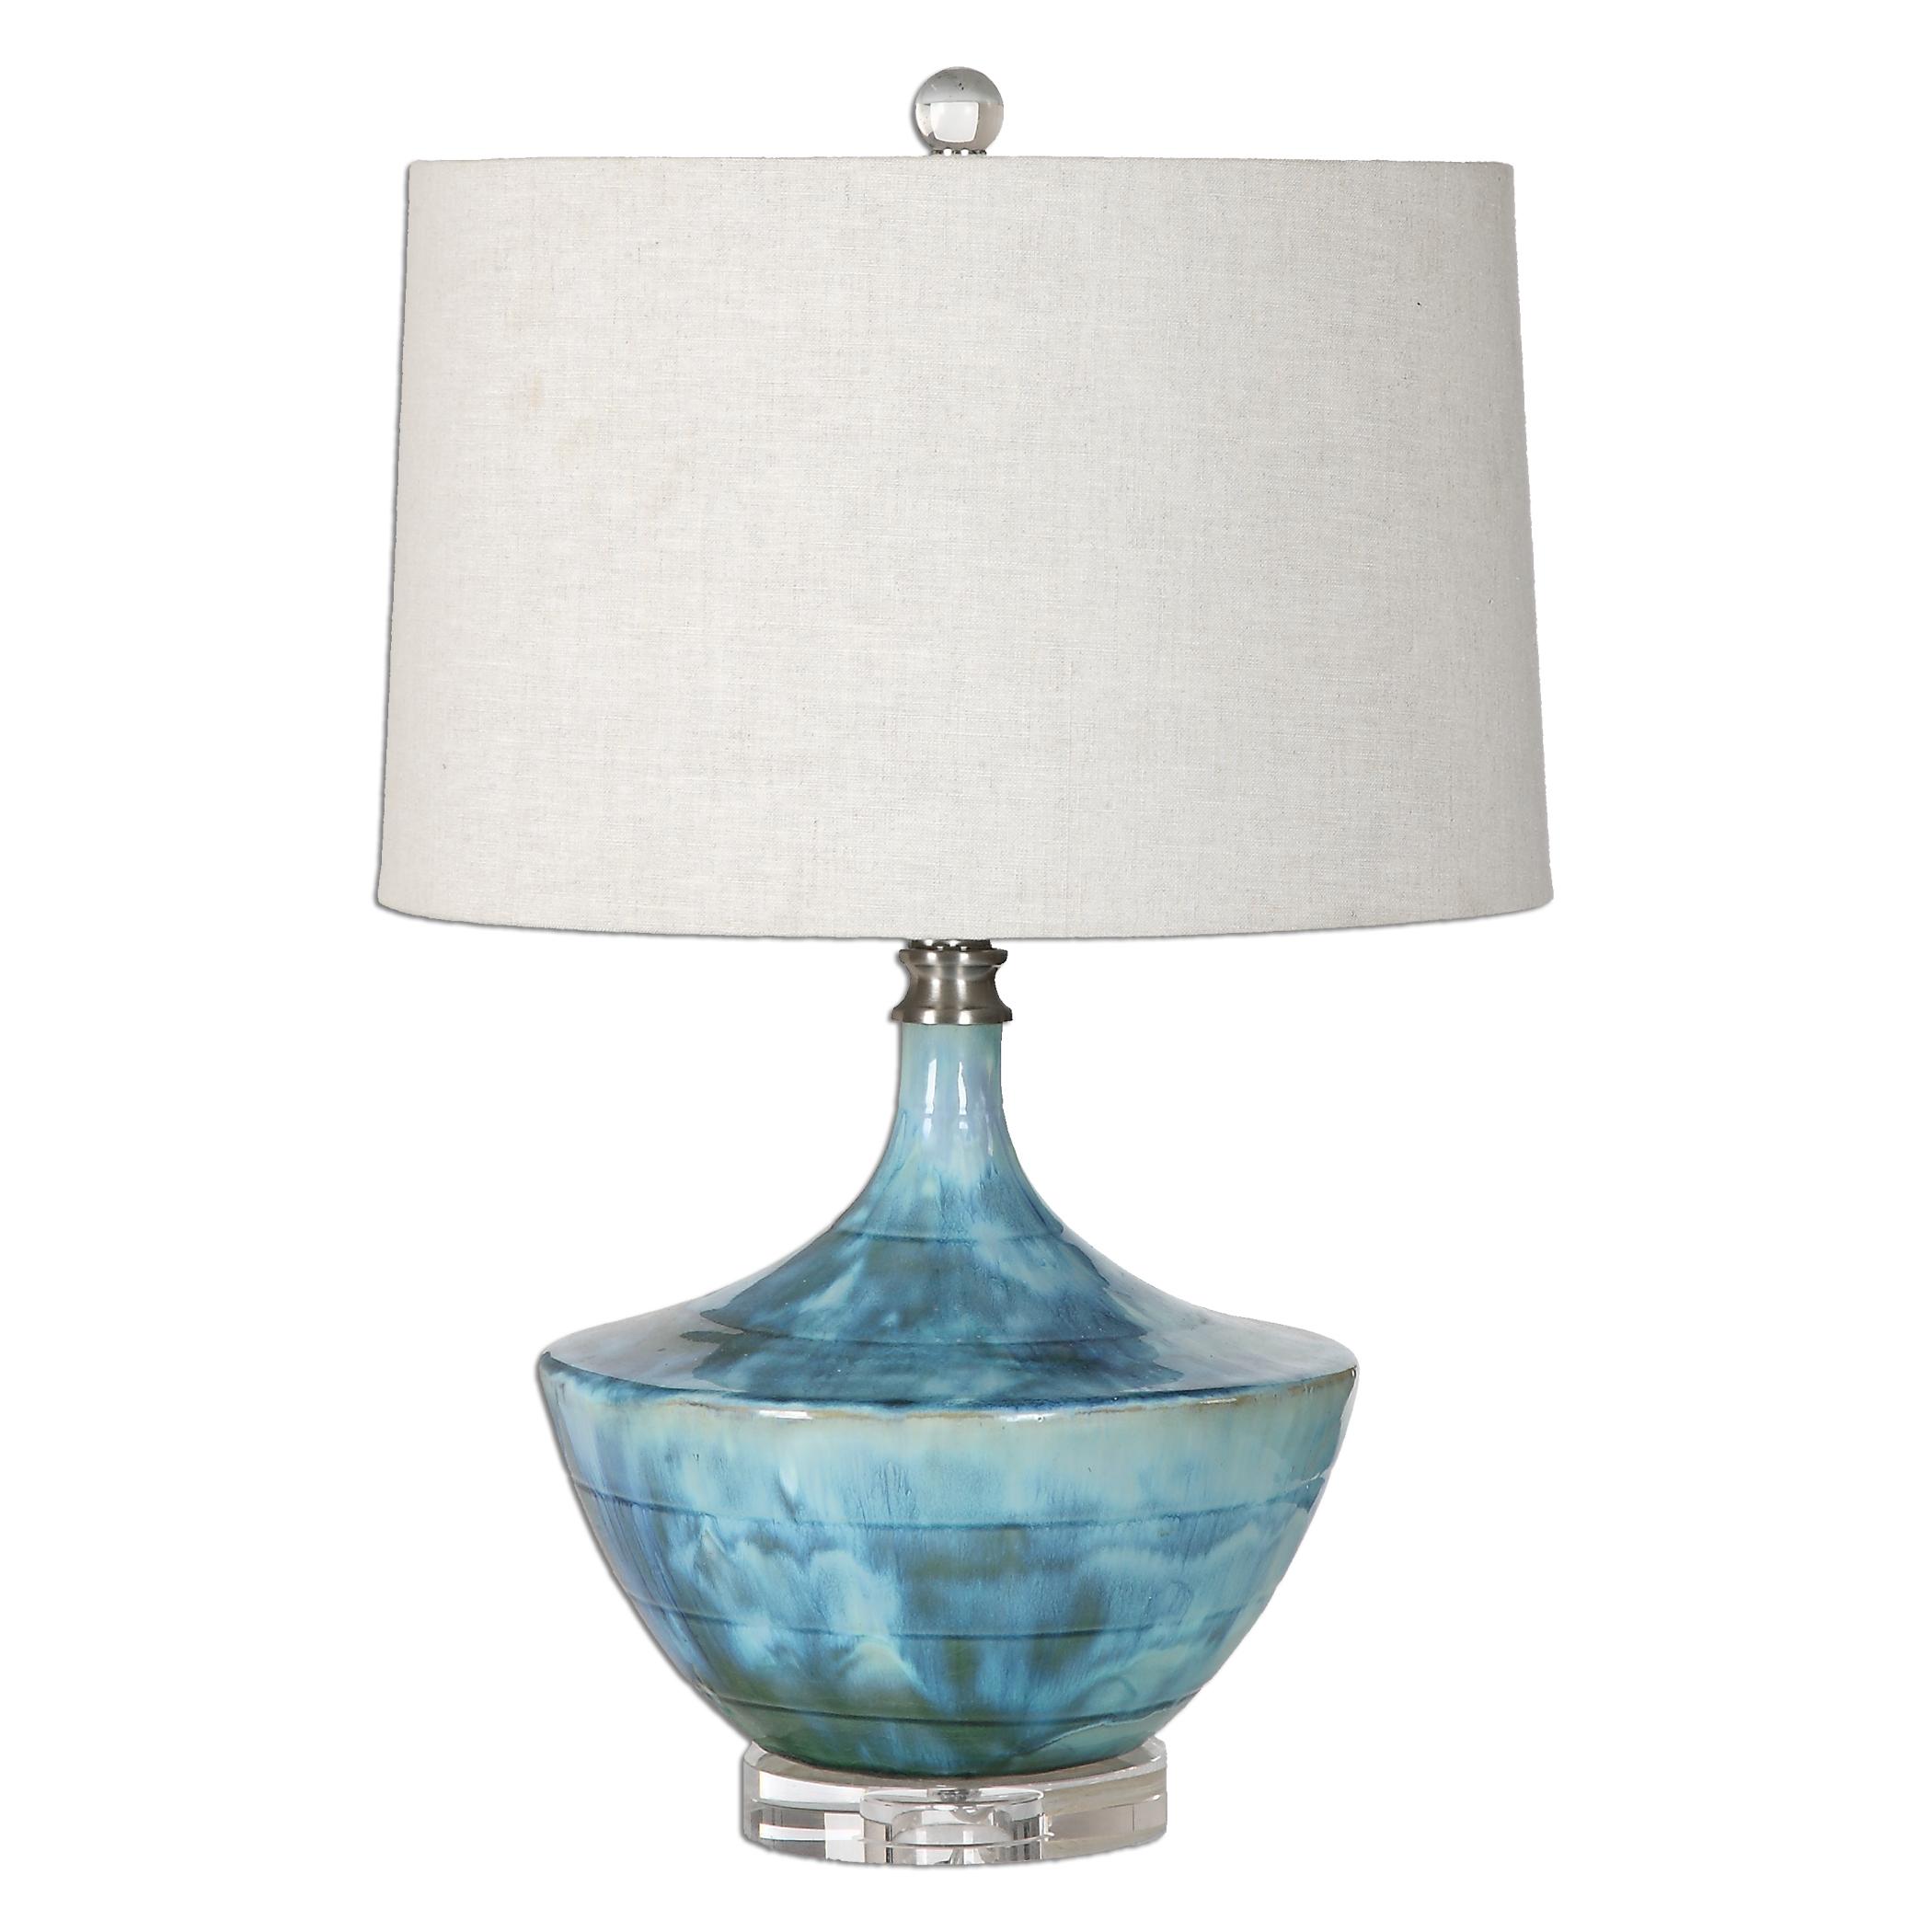 Chasida Blue Ceramic Lamp